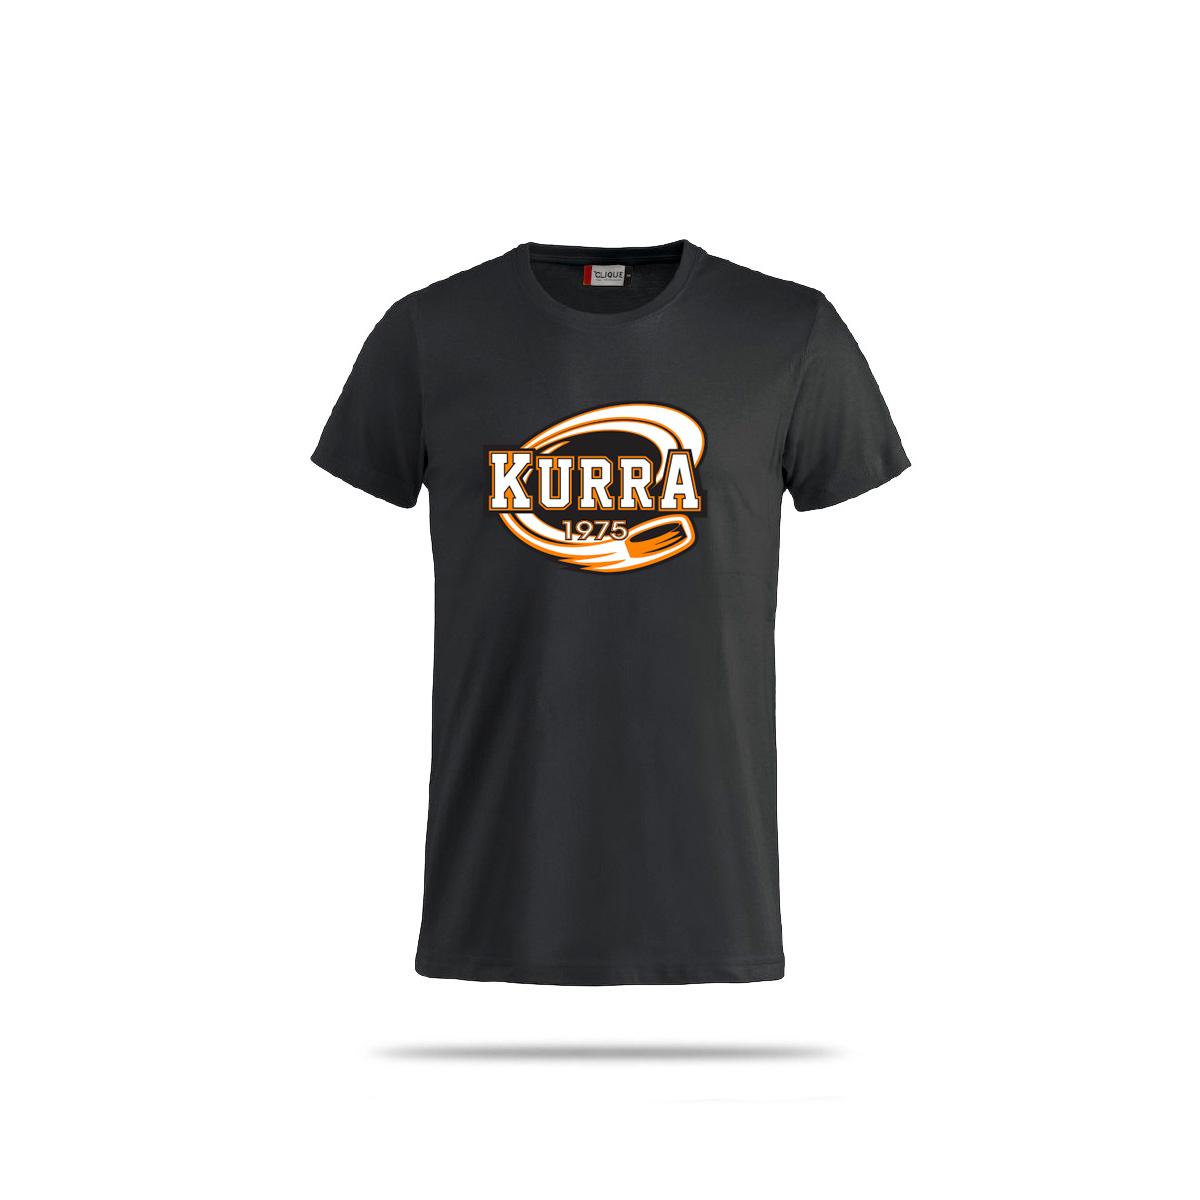 Kurra-Original-3020-musta